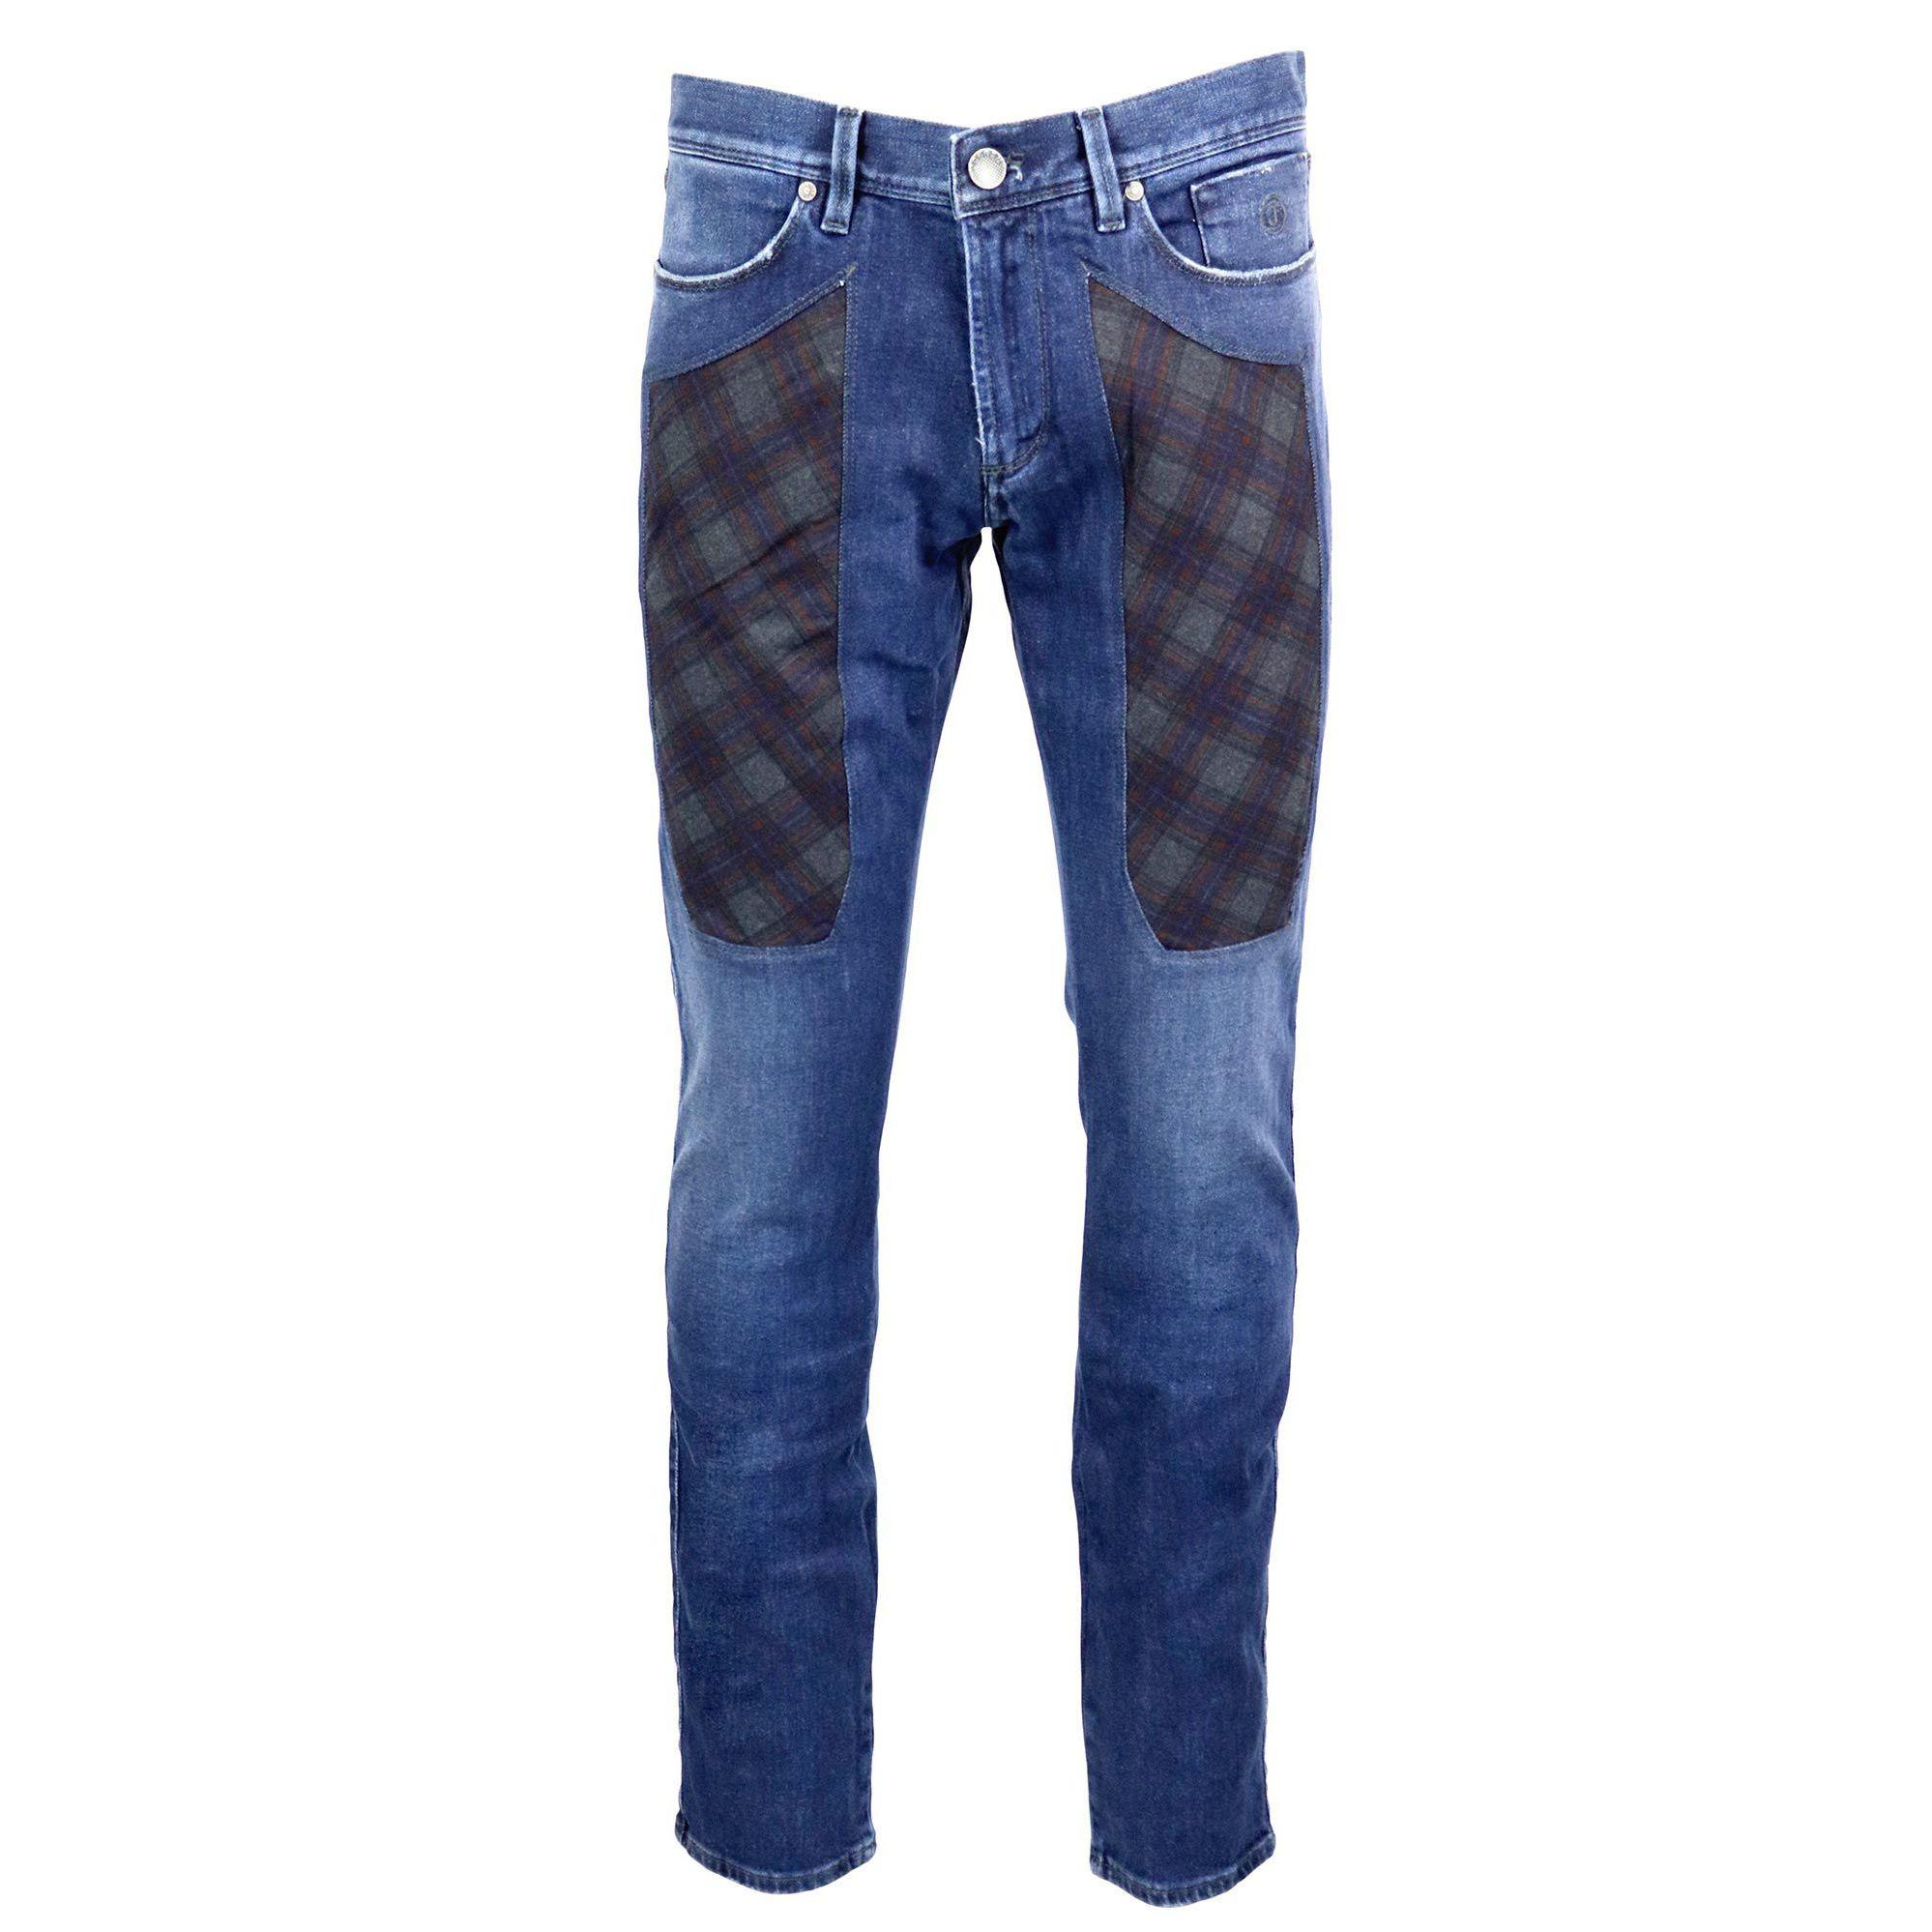 JECKERSON Jeans Slim Uomo